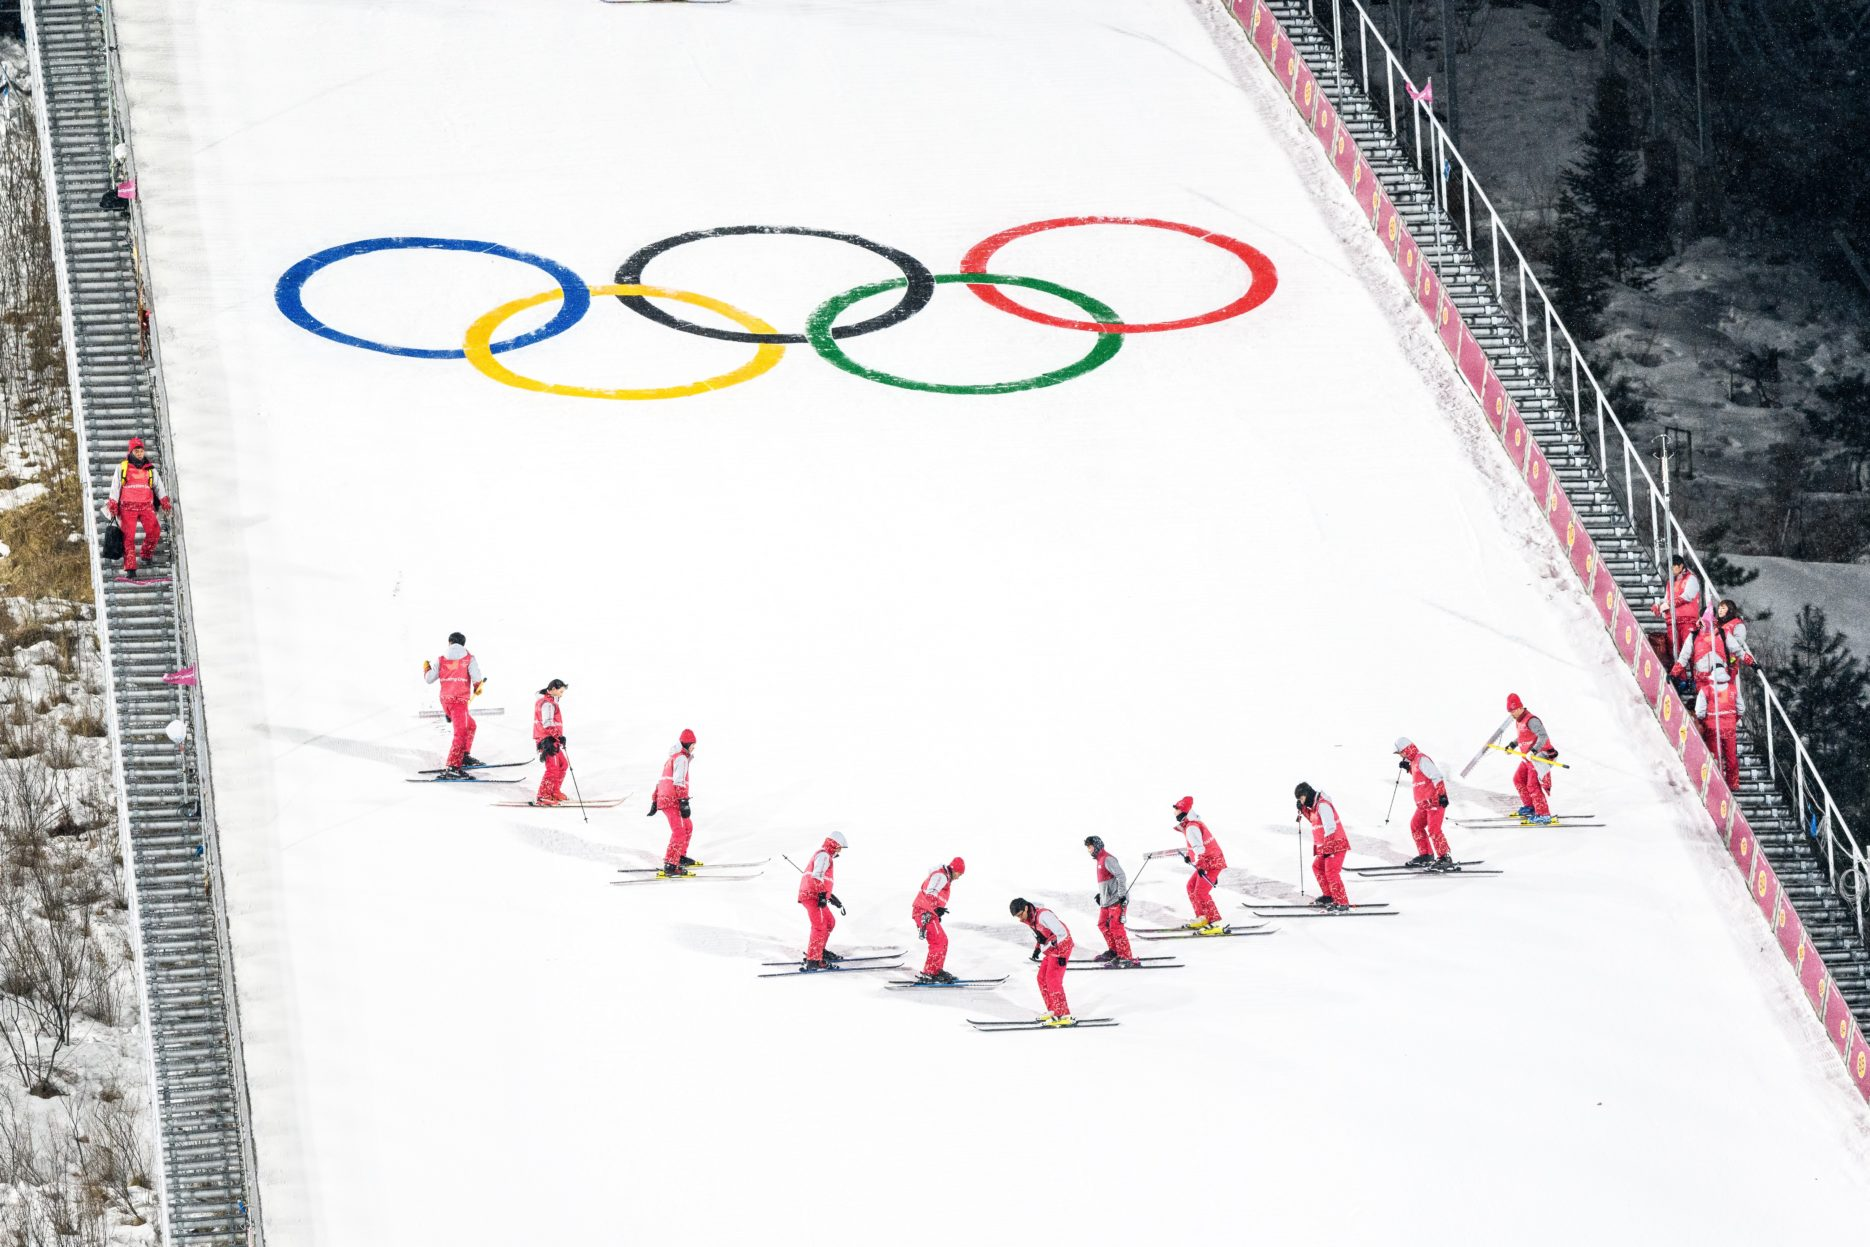 Olympics. Credit: Unsplash